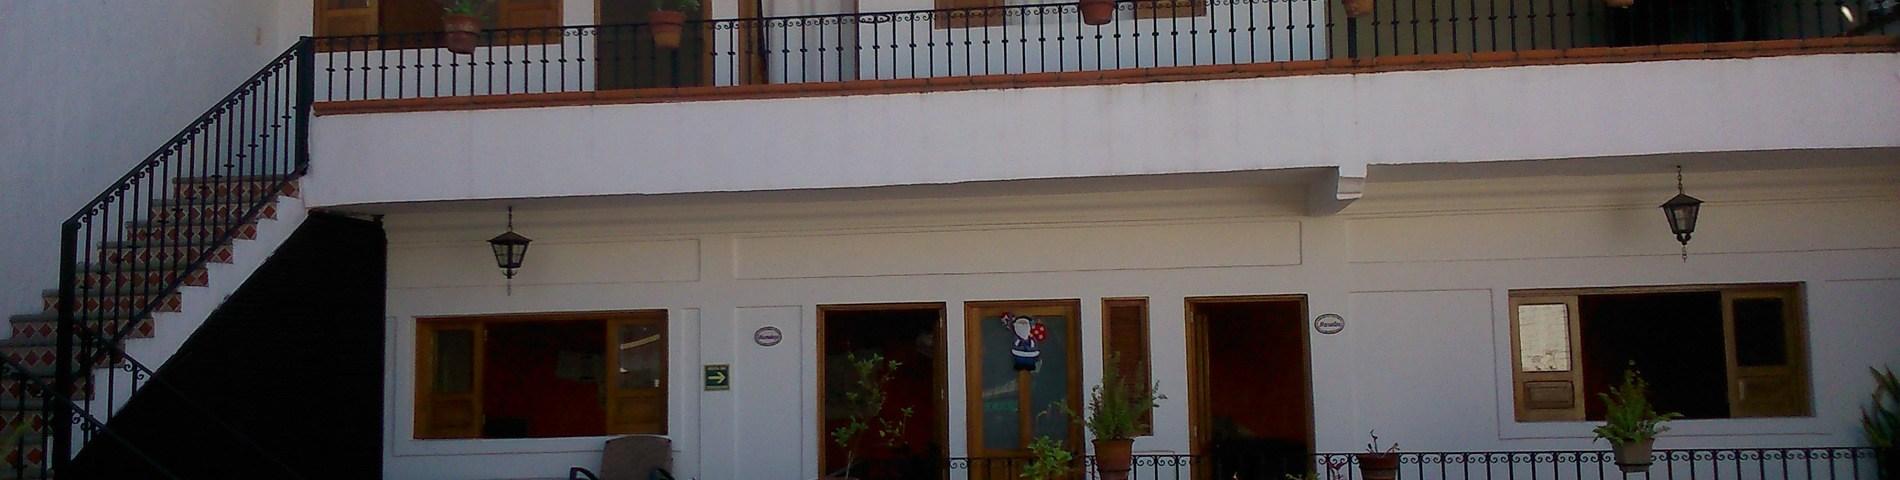 Spanish Experience Center bild 1